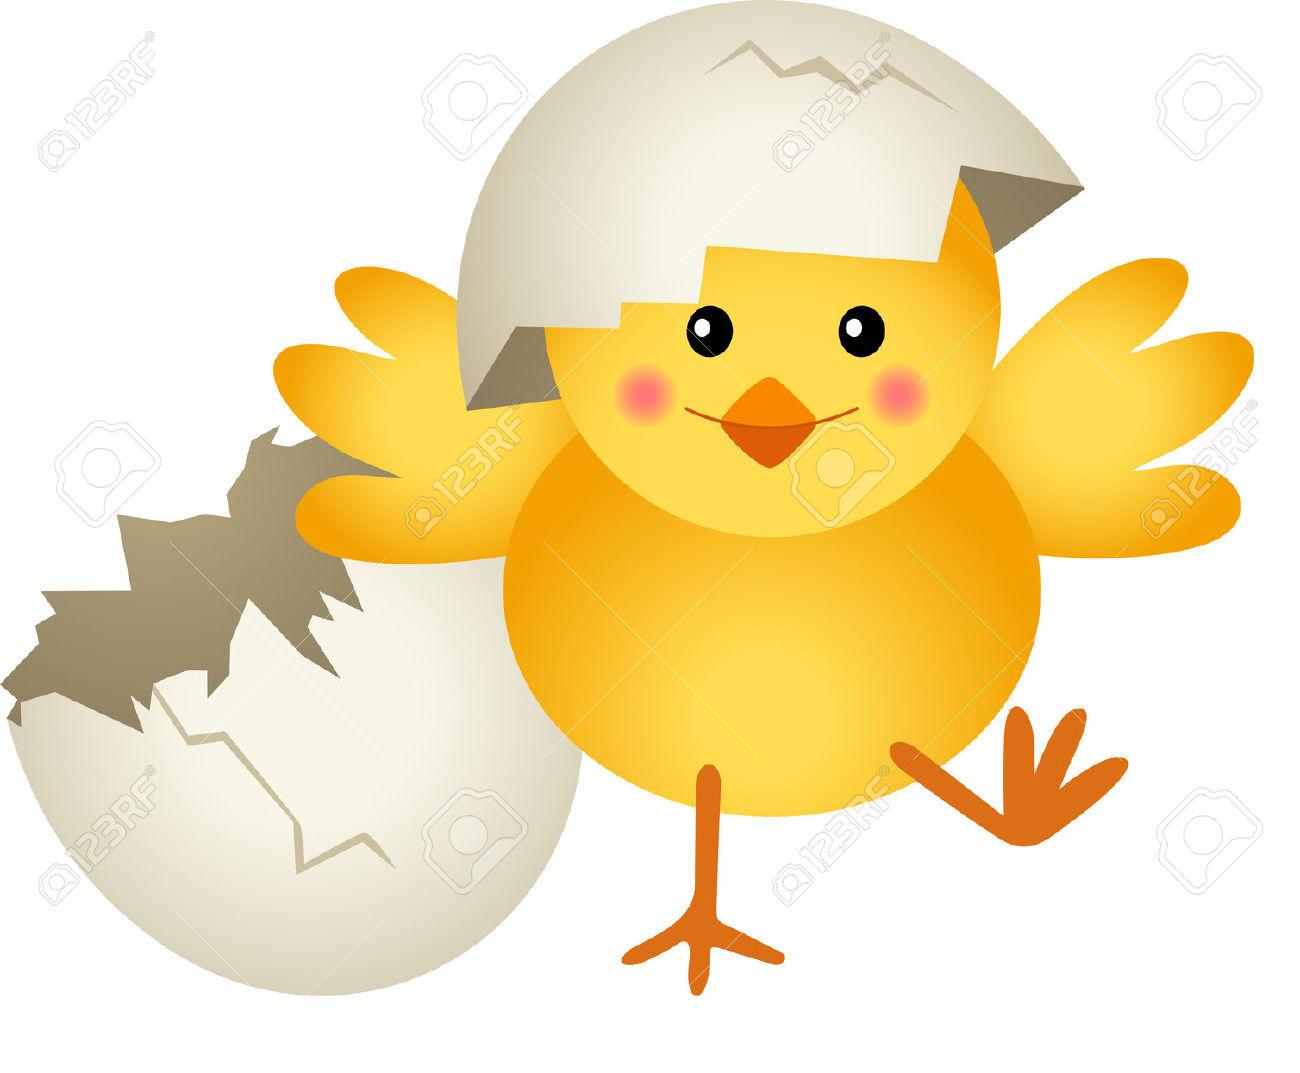 hight resolution of 1300x1073 chicken clipart suggestions for chicken clipart download chicken